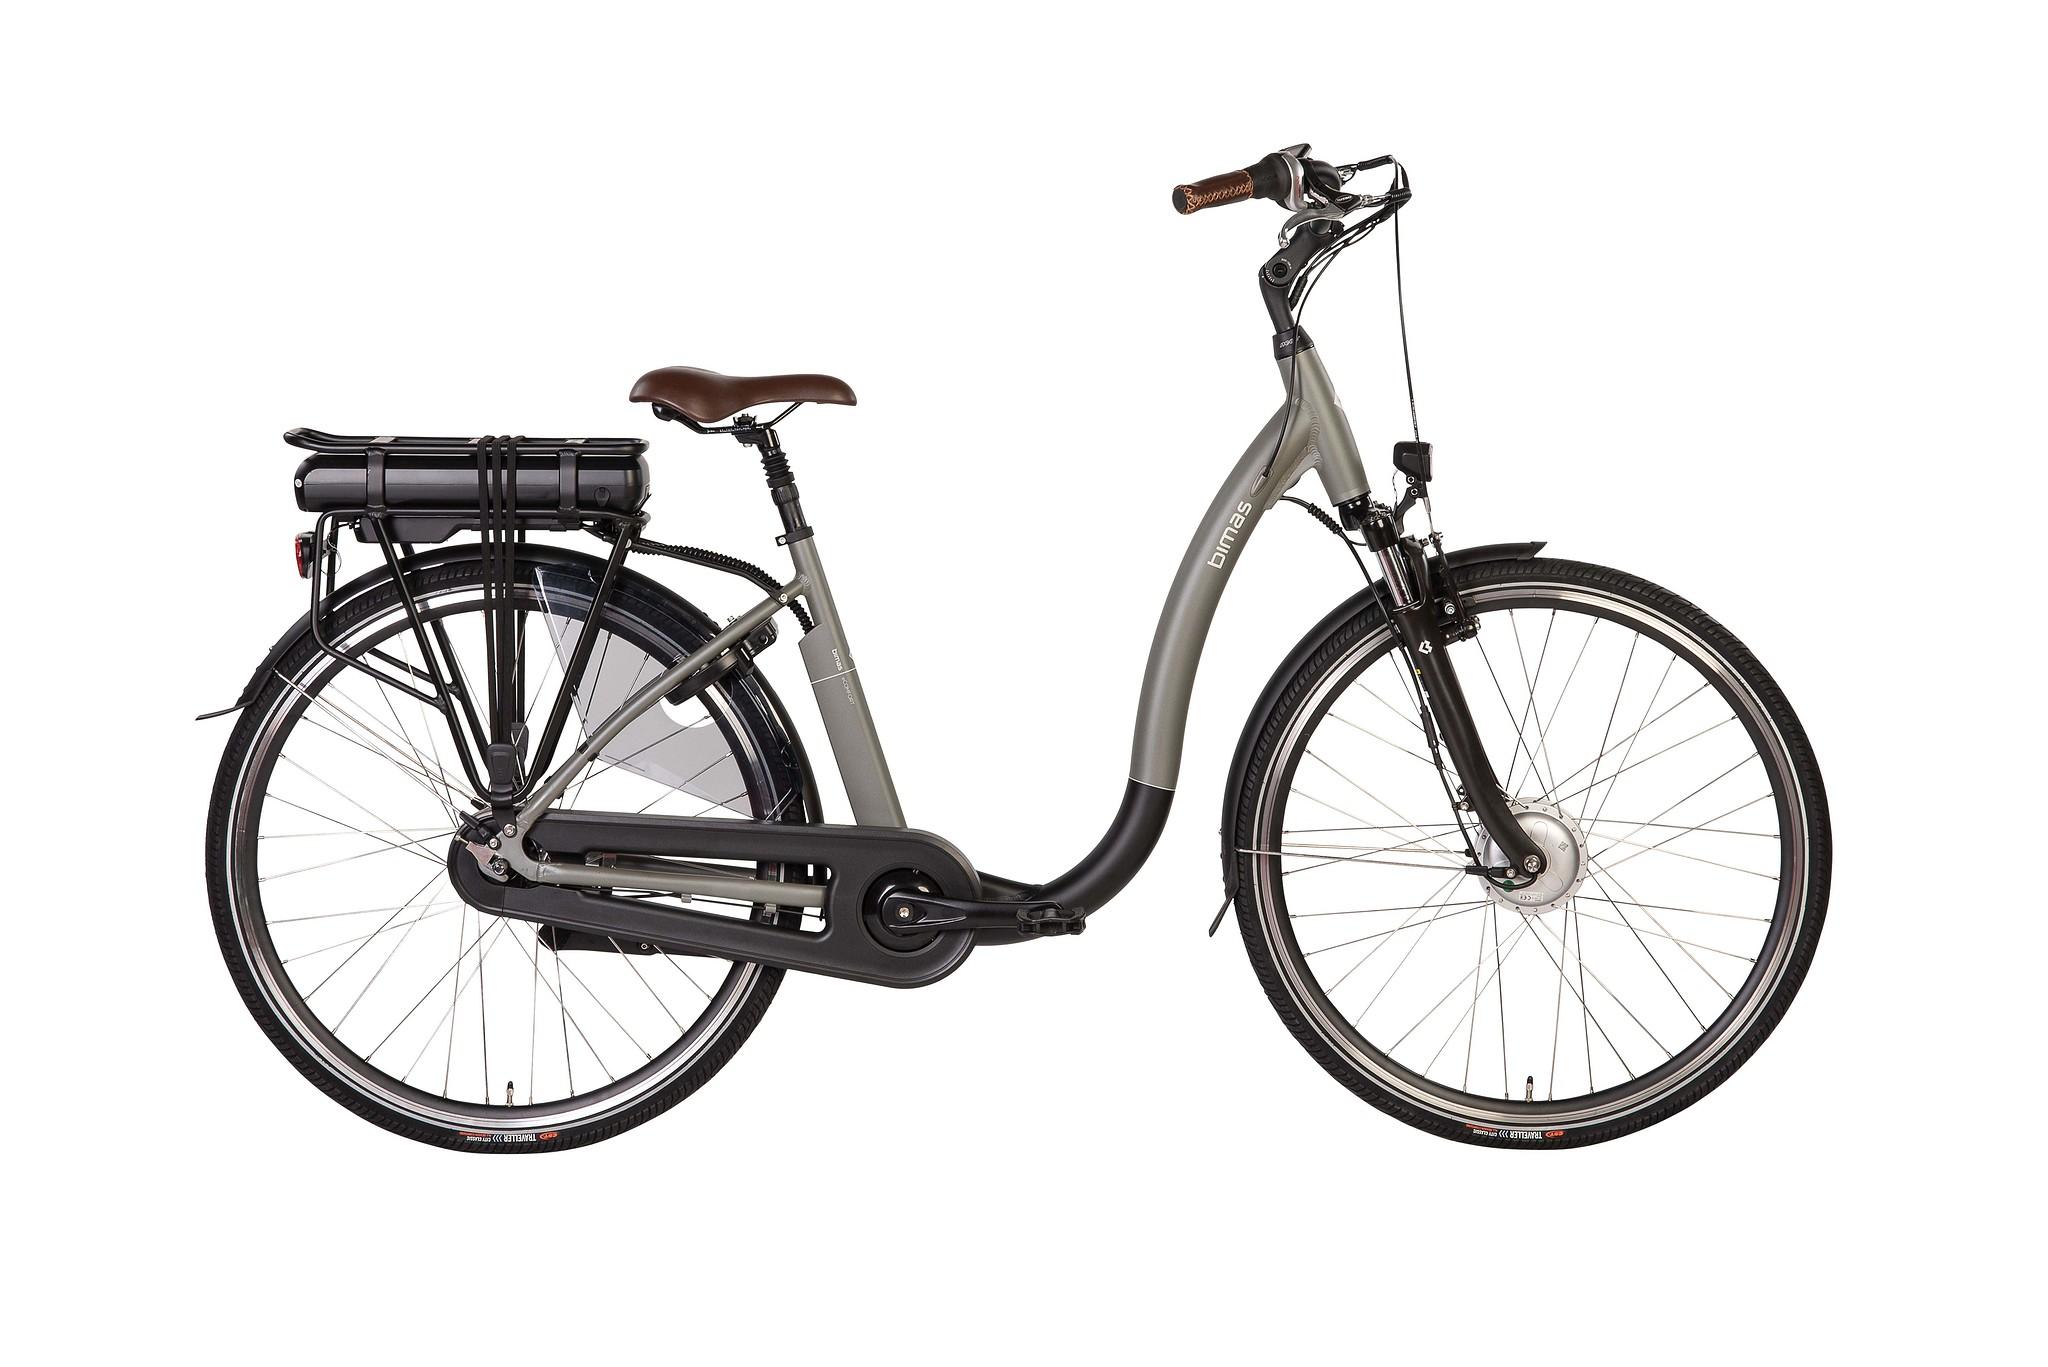 Bimas Elektrische fiets E-Comfort dames grijs 54cm 450 Watt Grijs